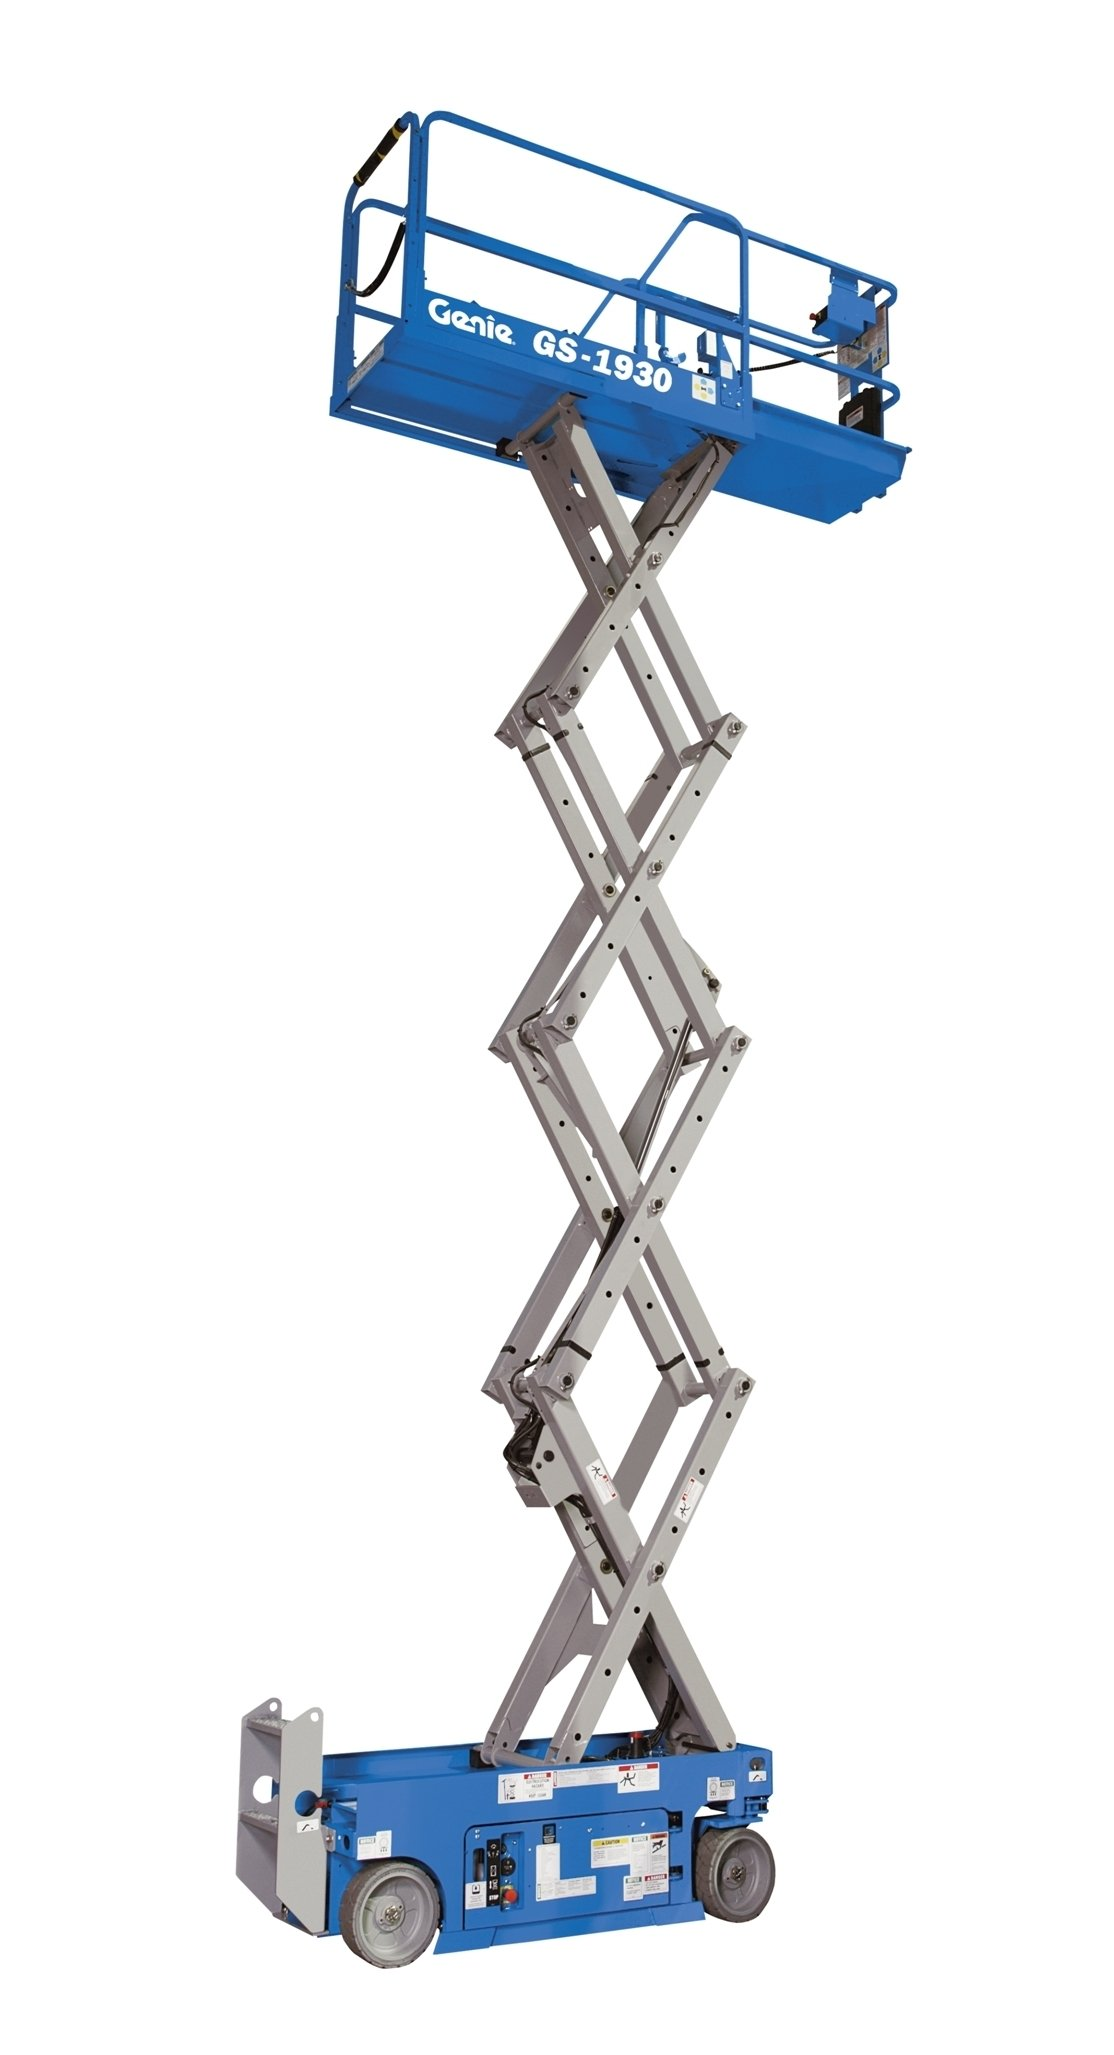 Genie GS-1930 Self-Propelled Electric Scissor Lift, 500 lbs Platform Load Capacity, 19' Lift Height by Genie